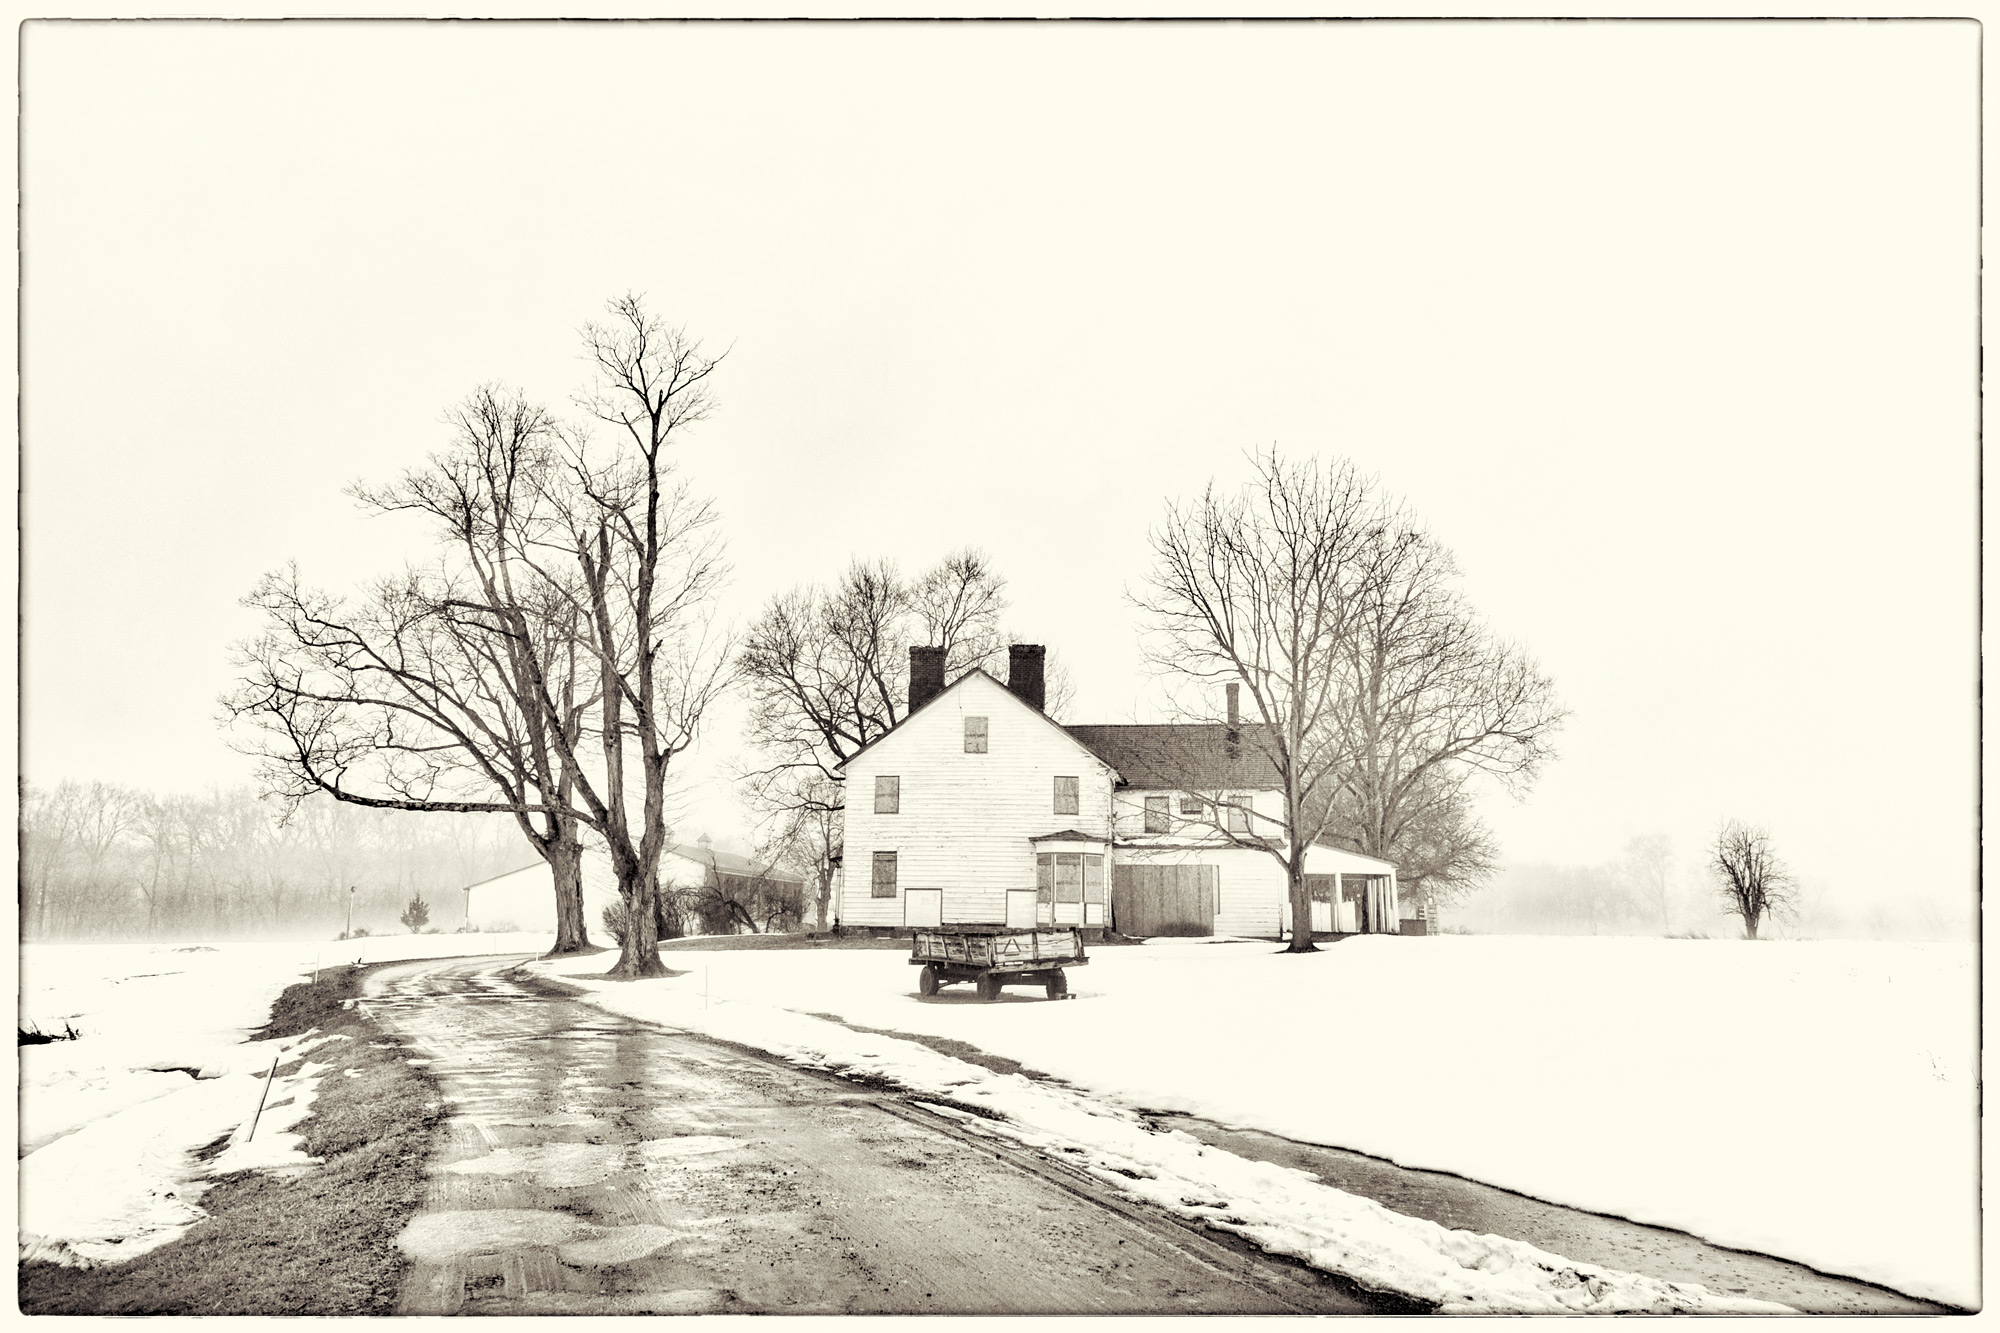 Foggy-Property-2.jpg